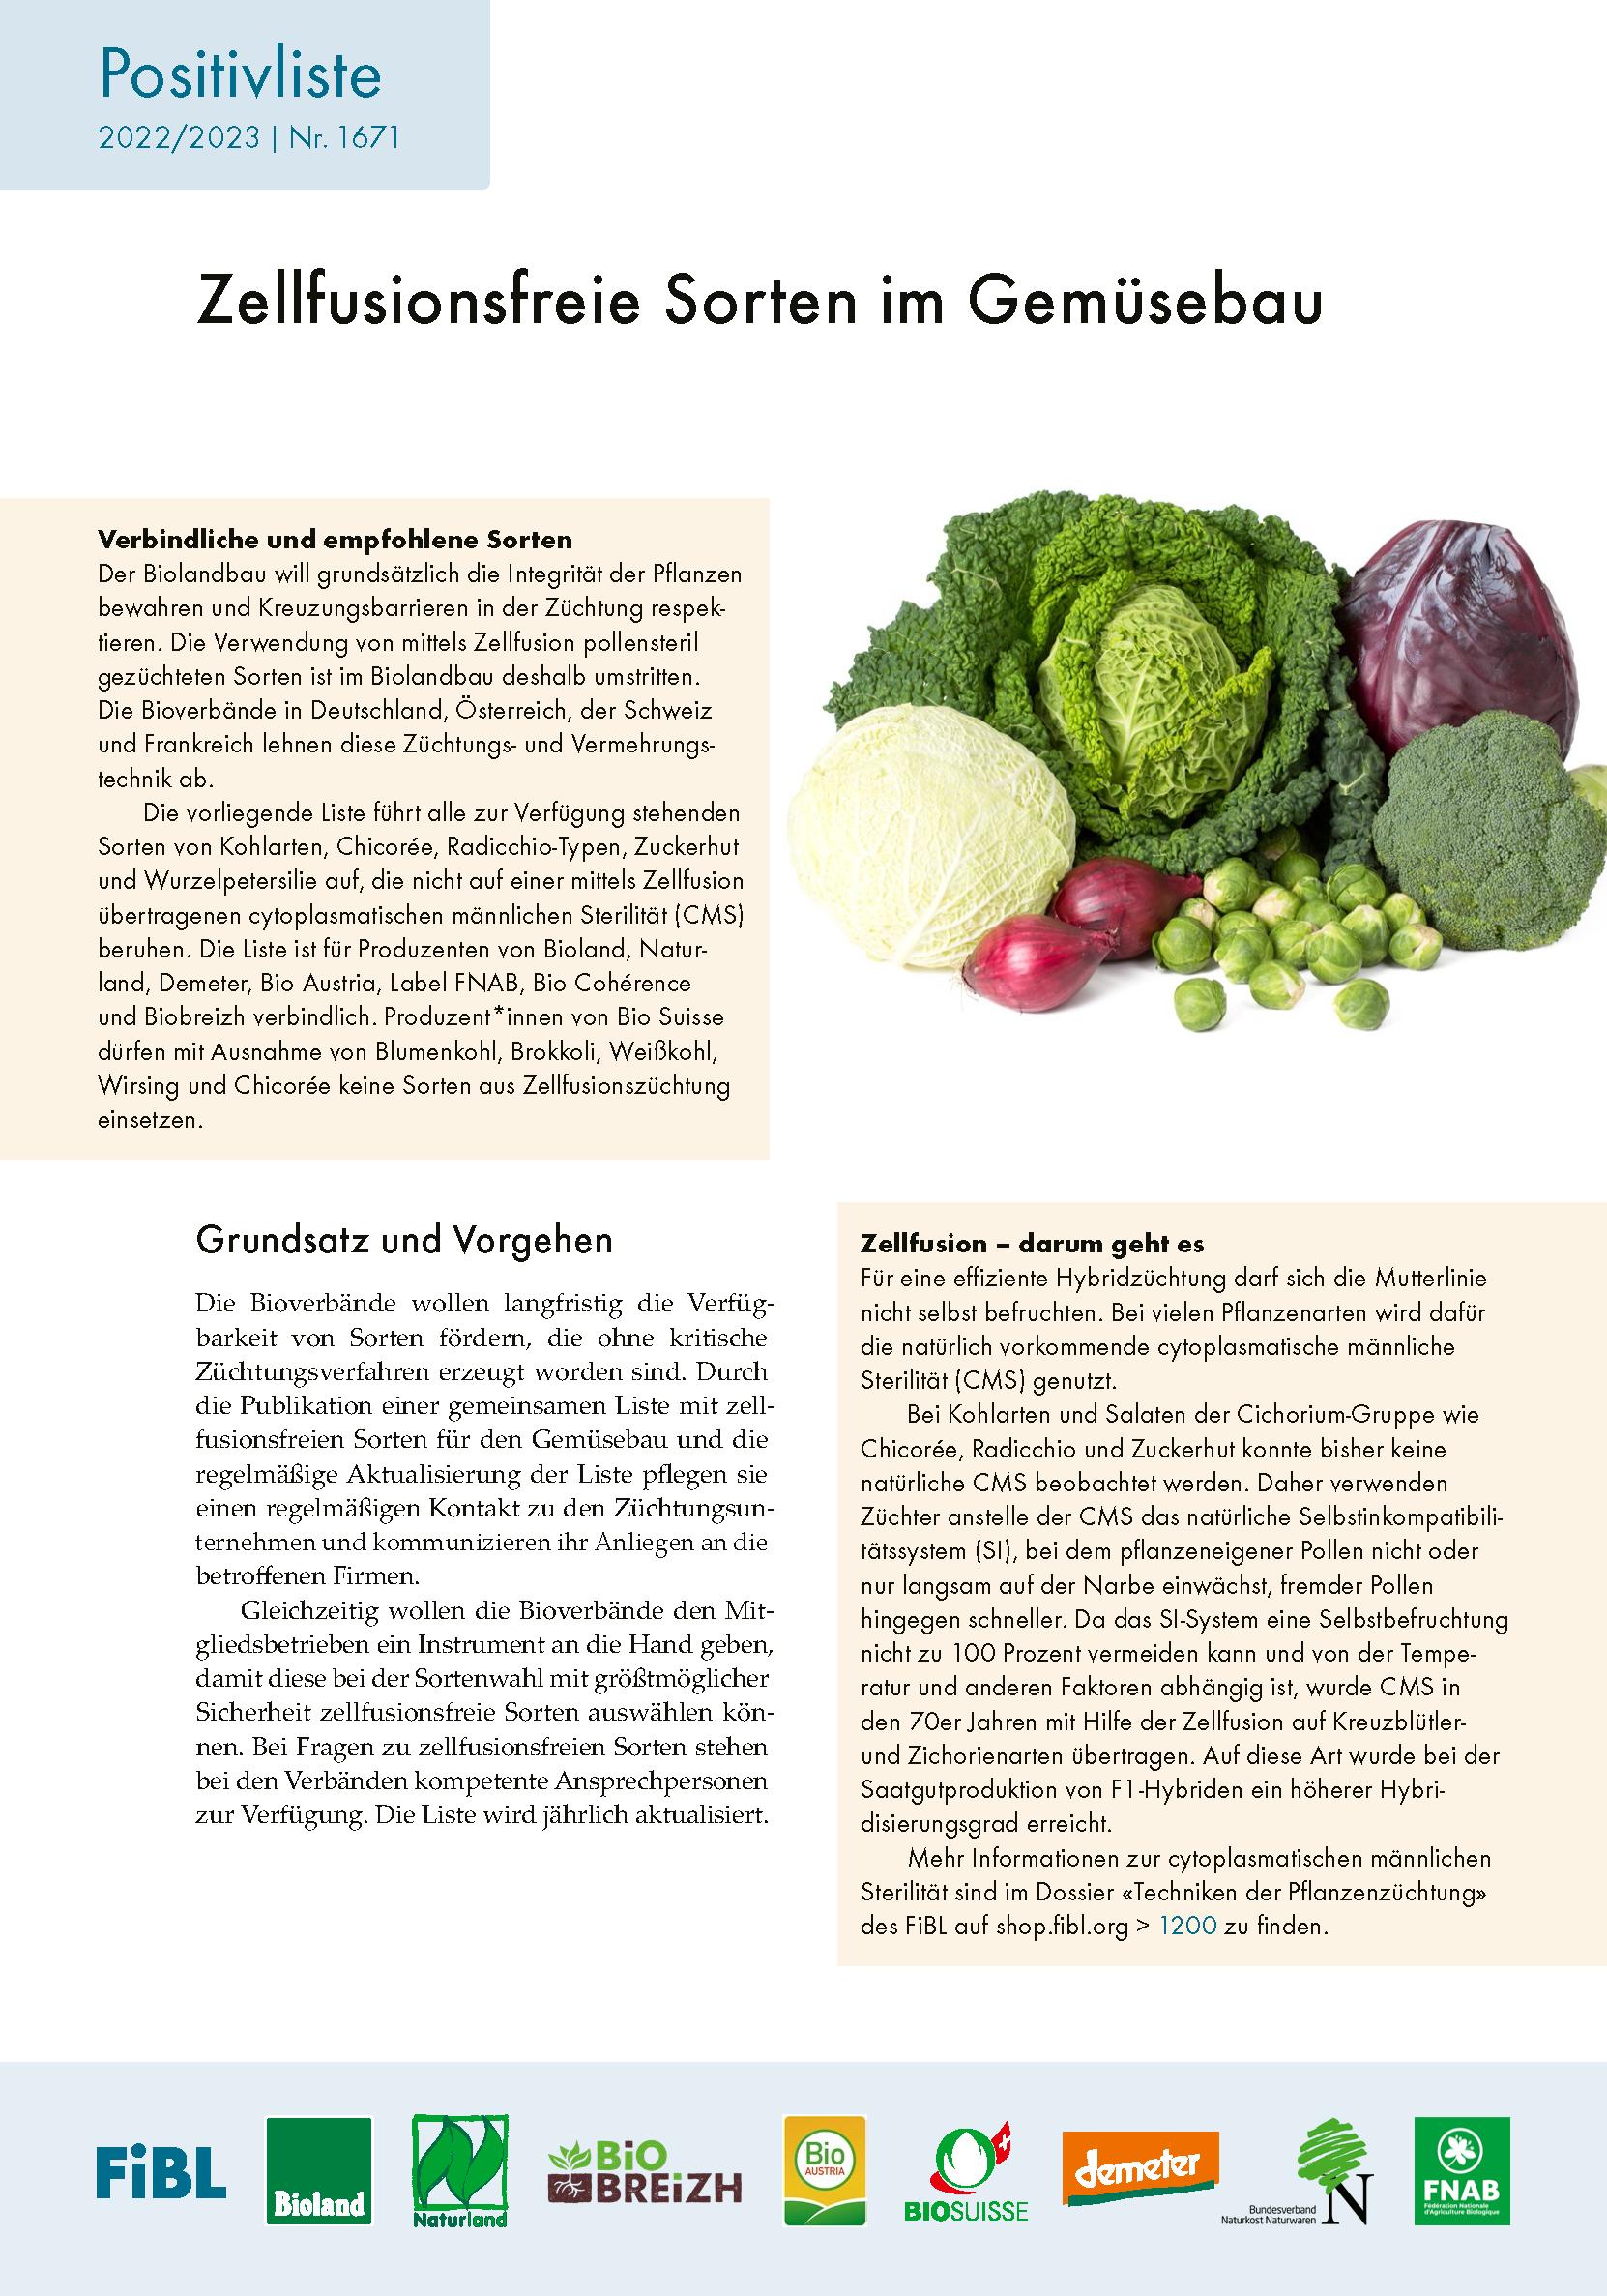 Zellfusionsfreie Sorten im Gemüsebau